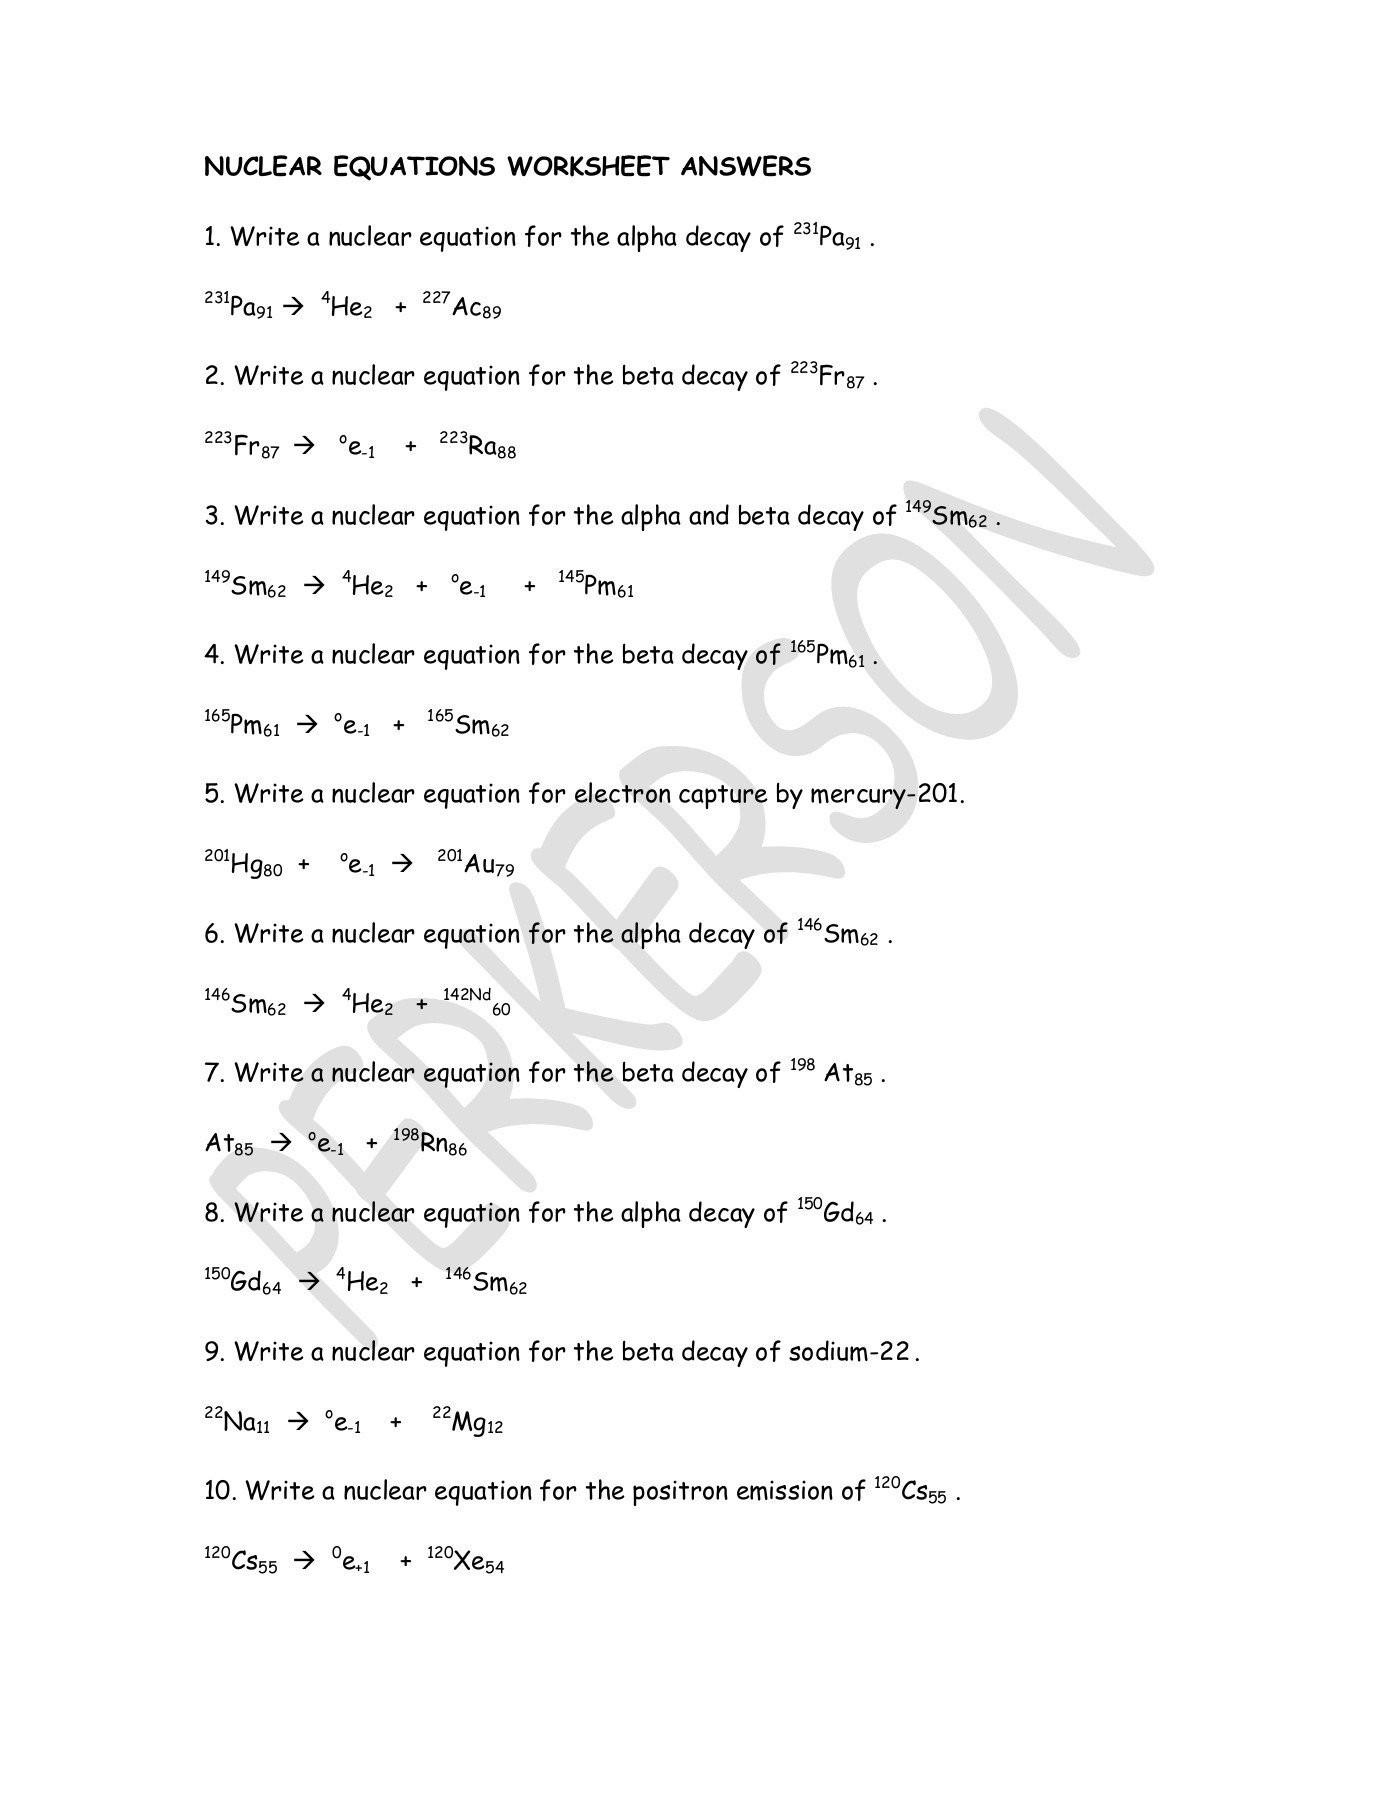 Balancing Nuclear Equations Worksheet Answers 20 Nuclear Equations Worksheet Answers